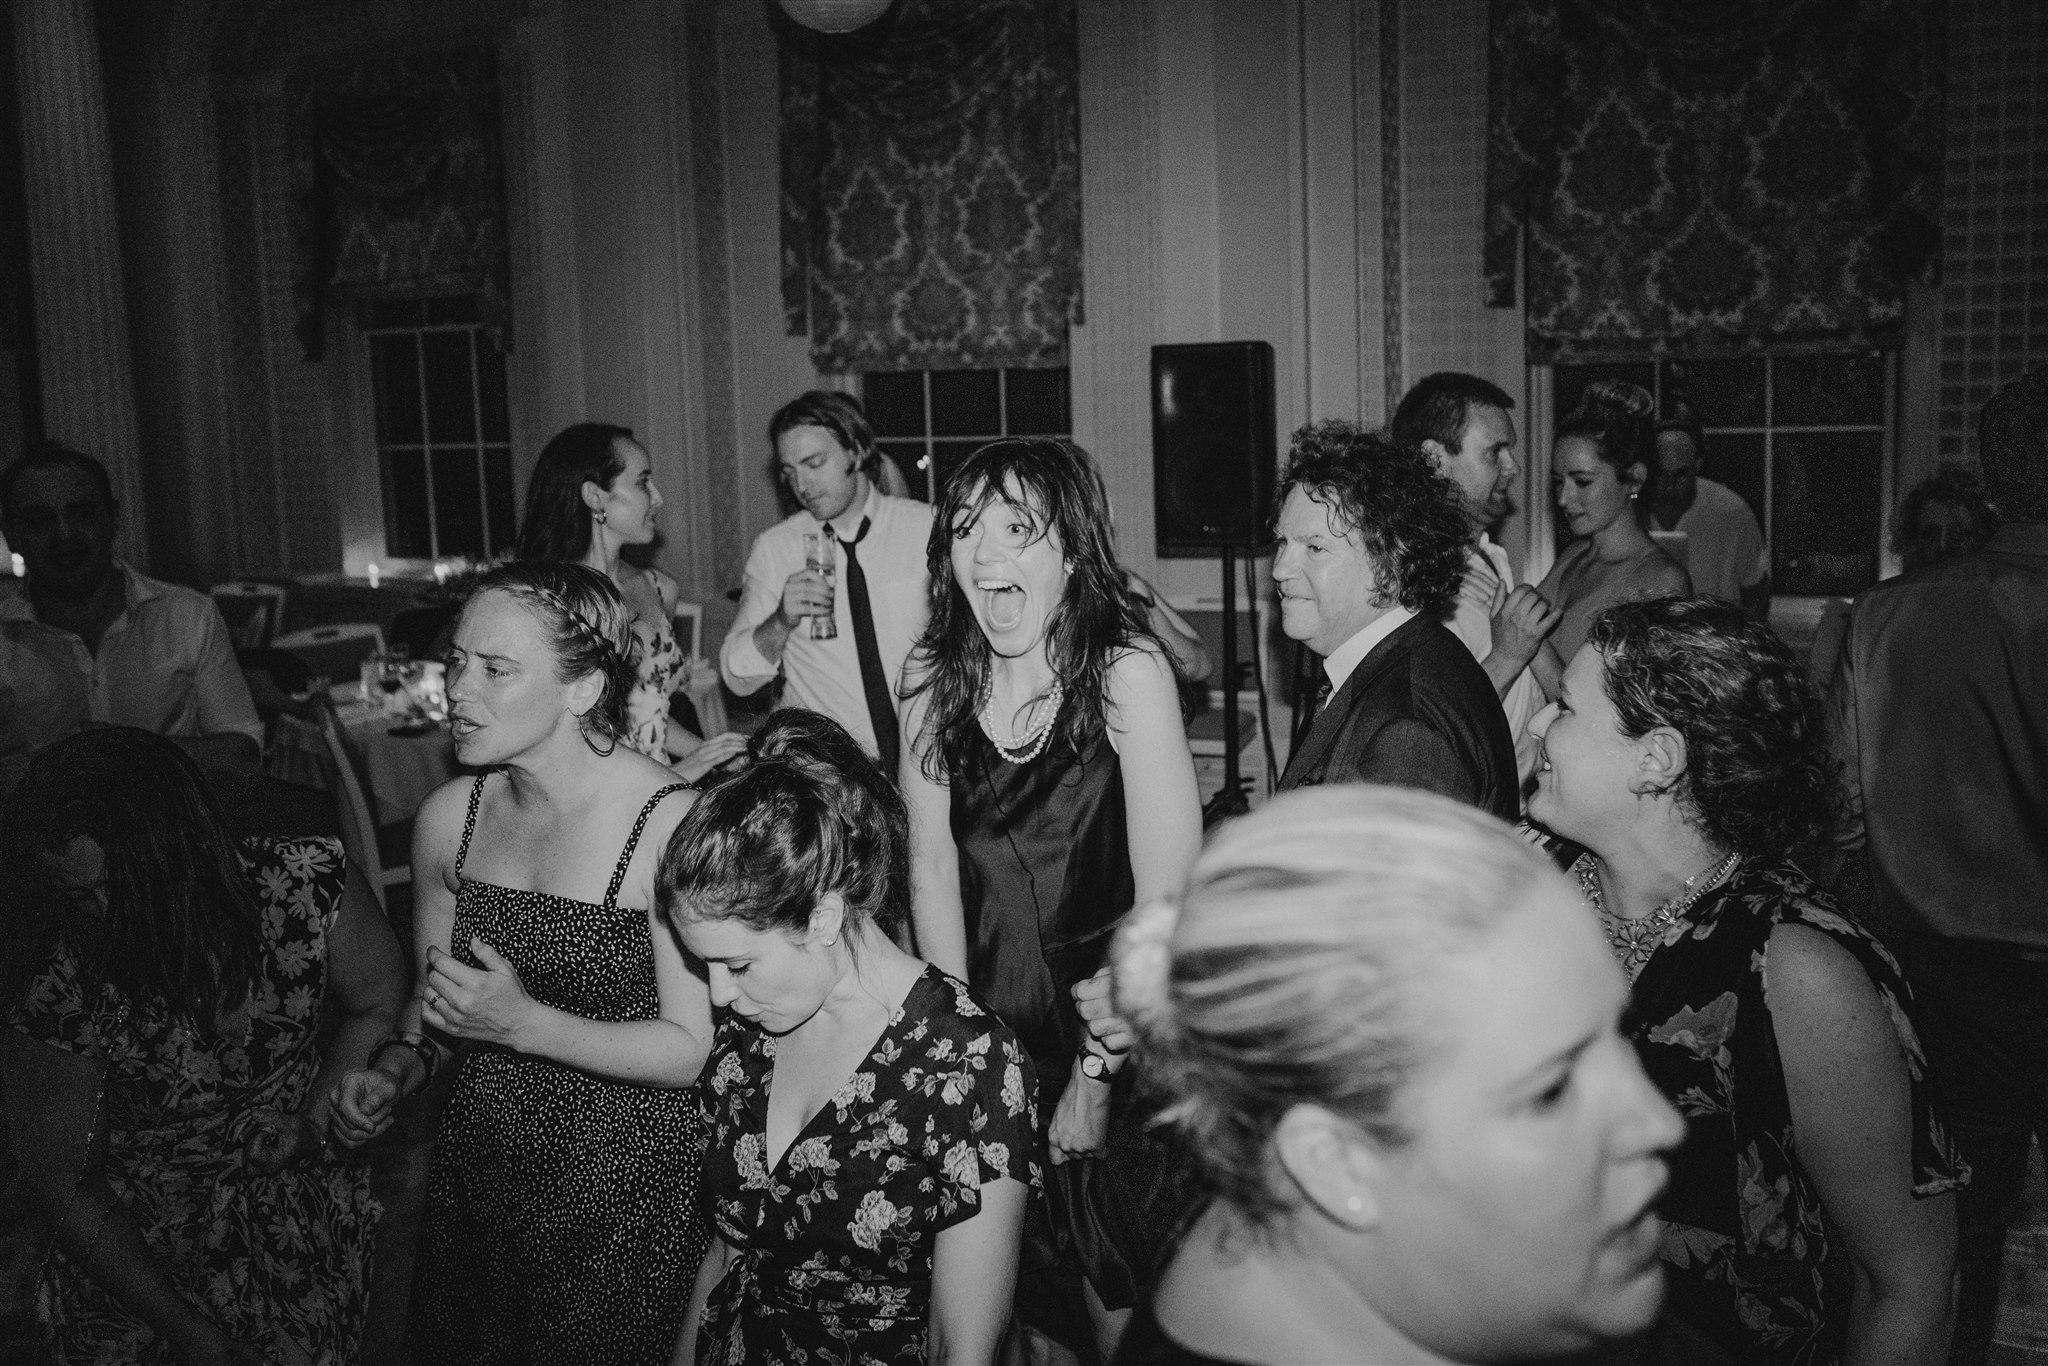 Chellise_Michael_Photography_Hudson_Valley_Wedding_Photographer_Otesaga_Hotel-6246.jpg